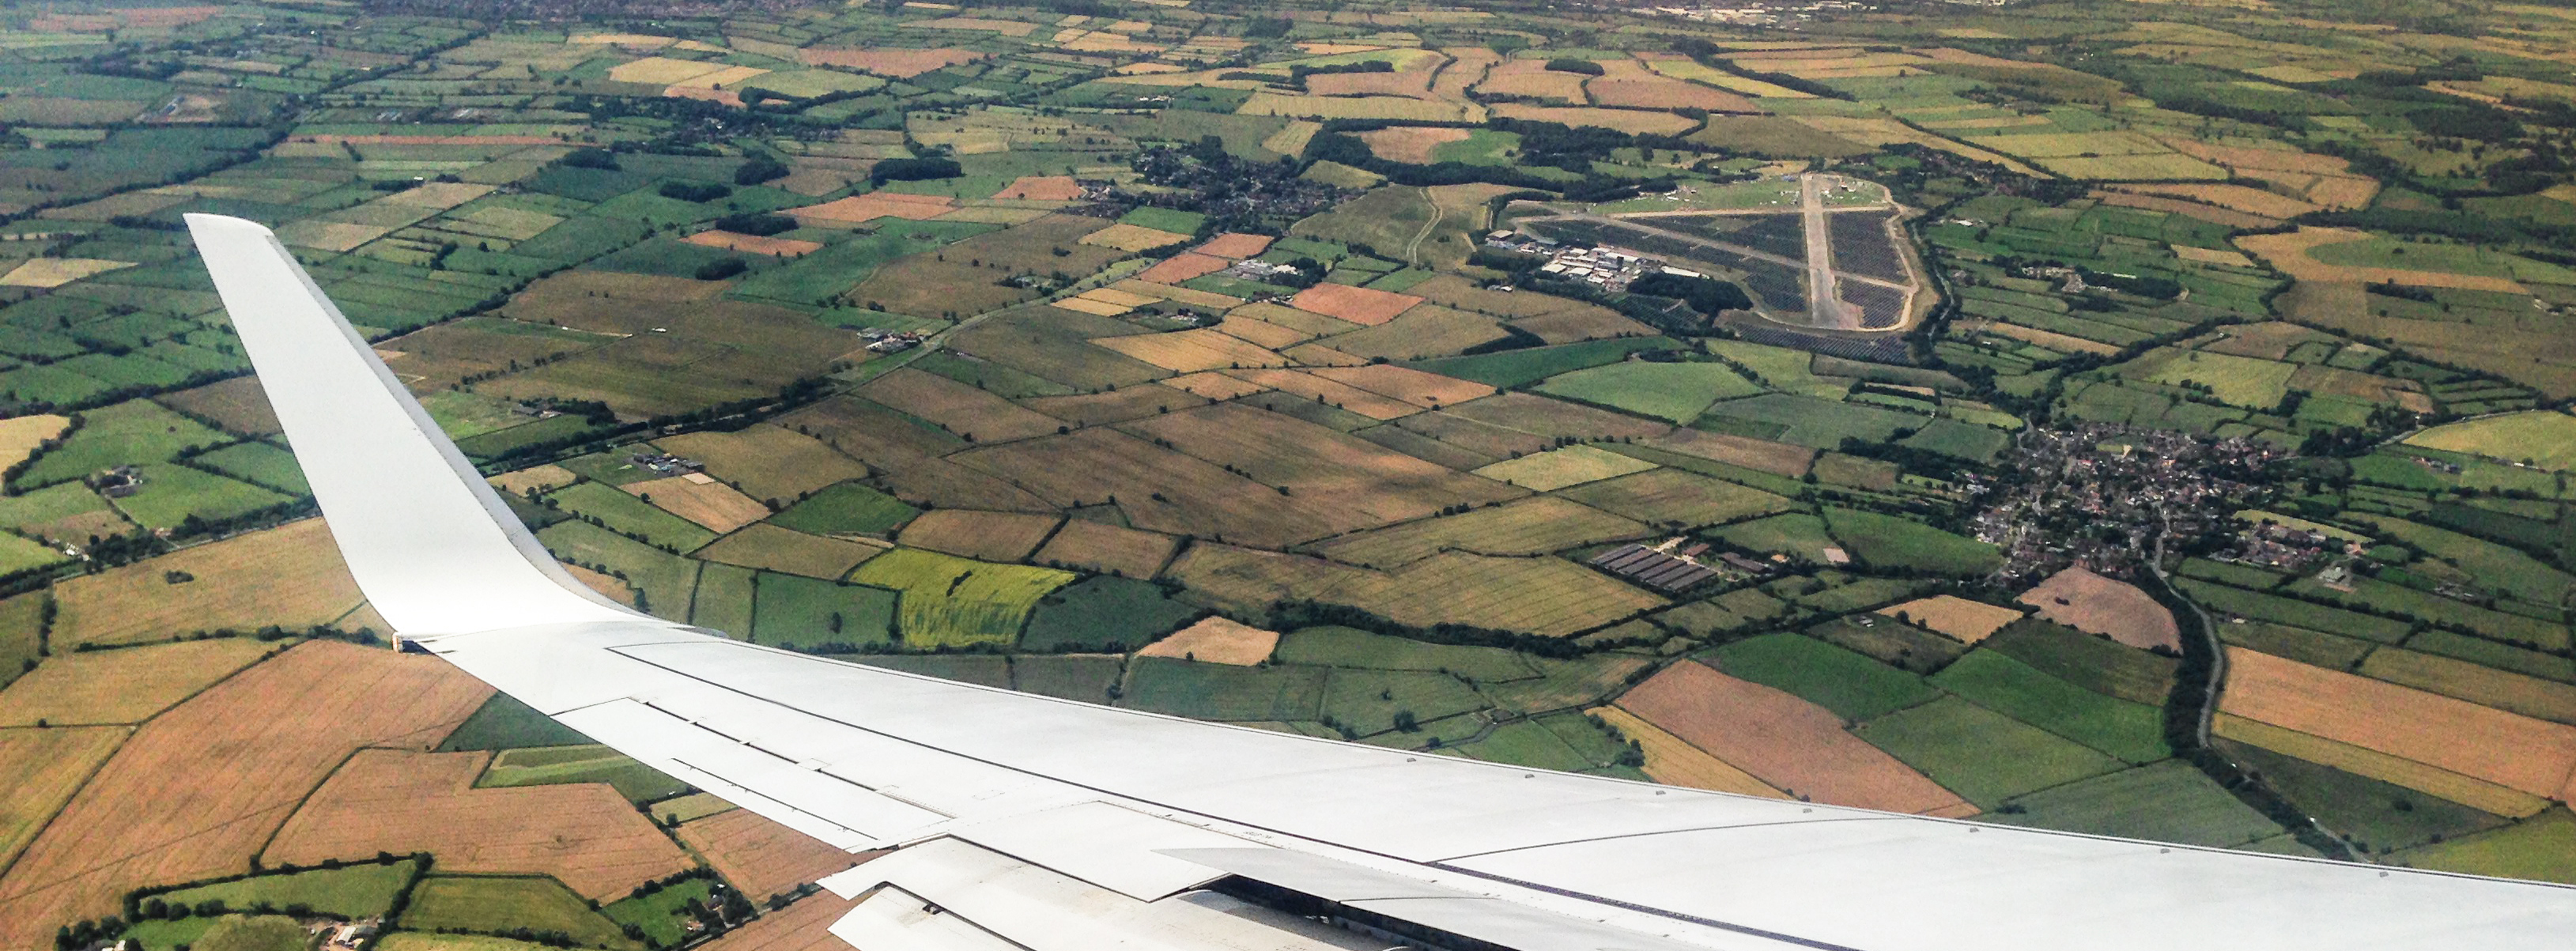 Flugzeug fliegt über Feld